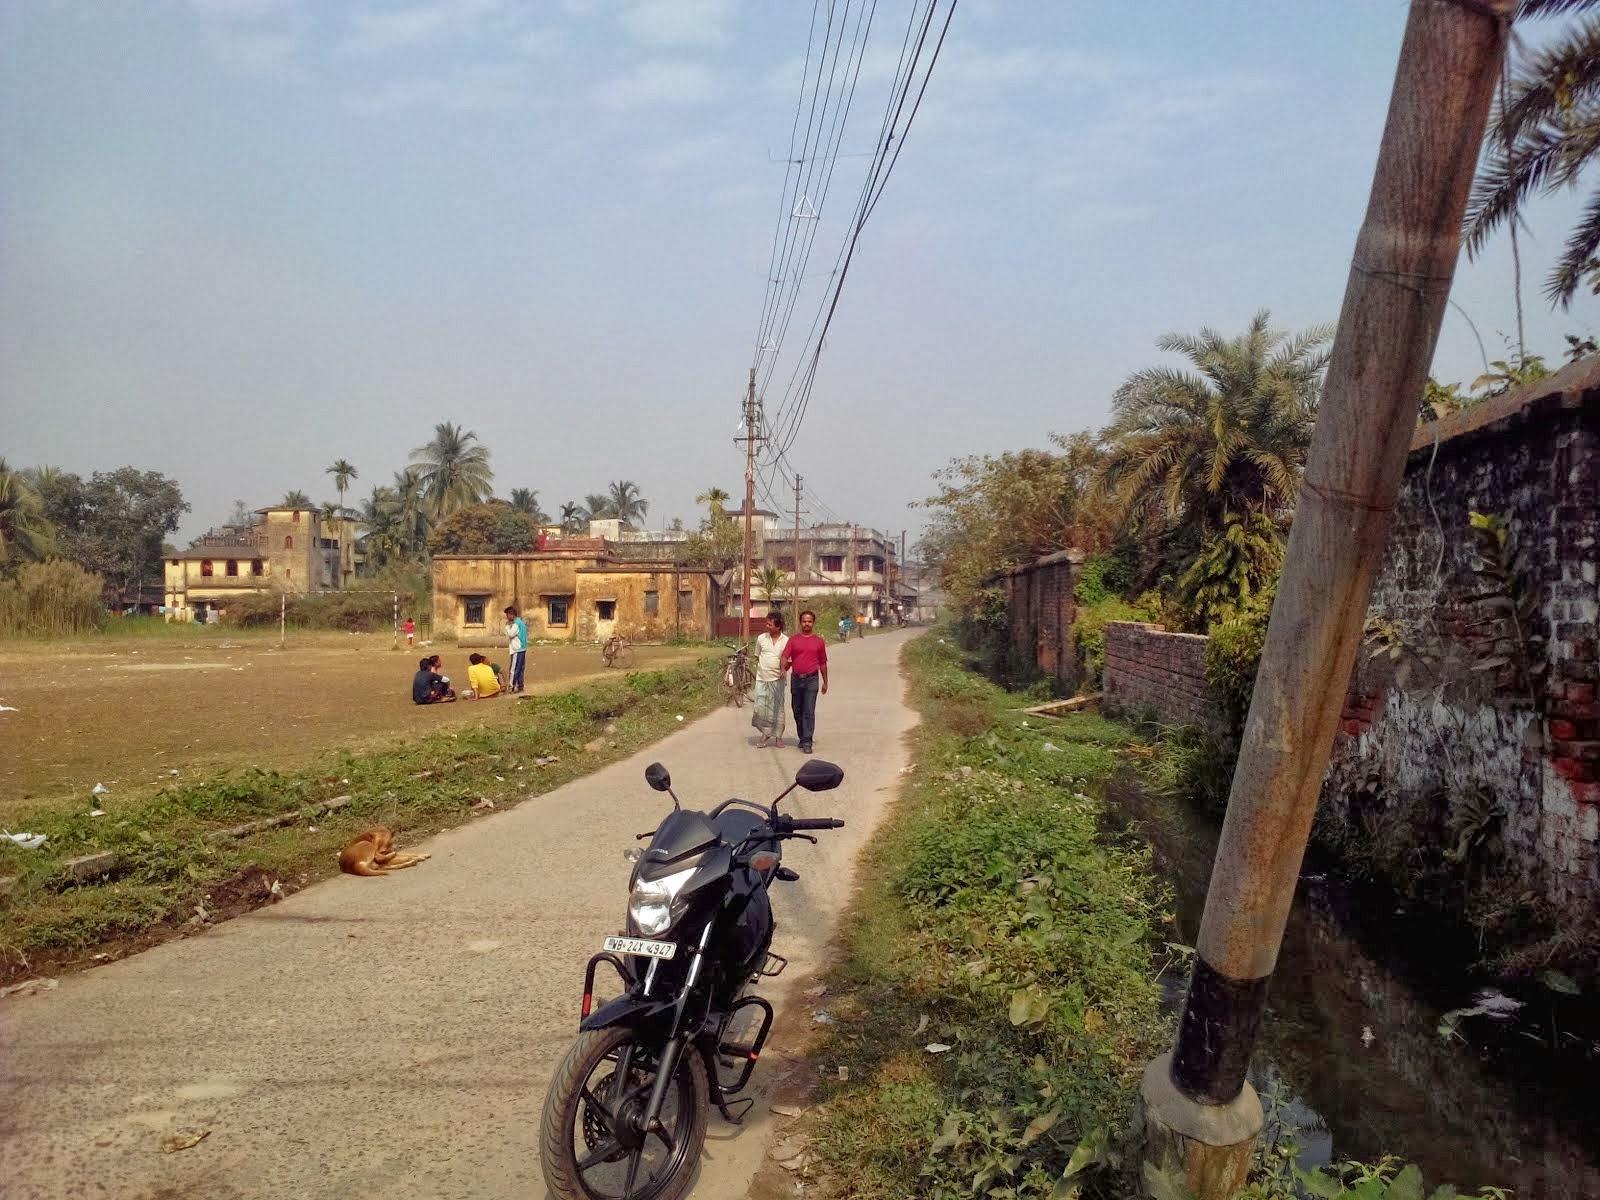 Kishori Mohan Bandyopadhyay Road, Panihati, West Bengal, India India.